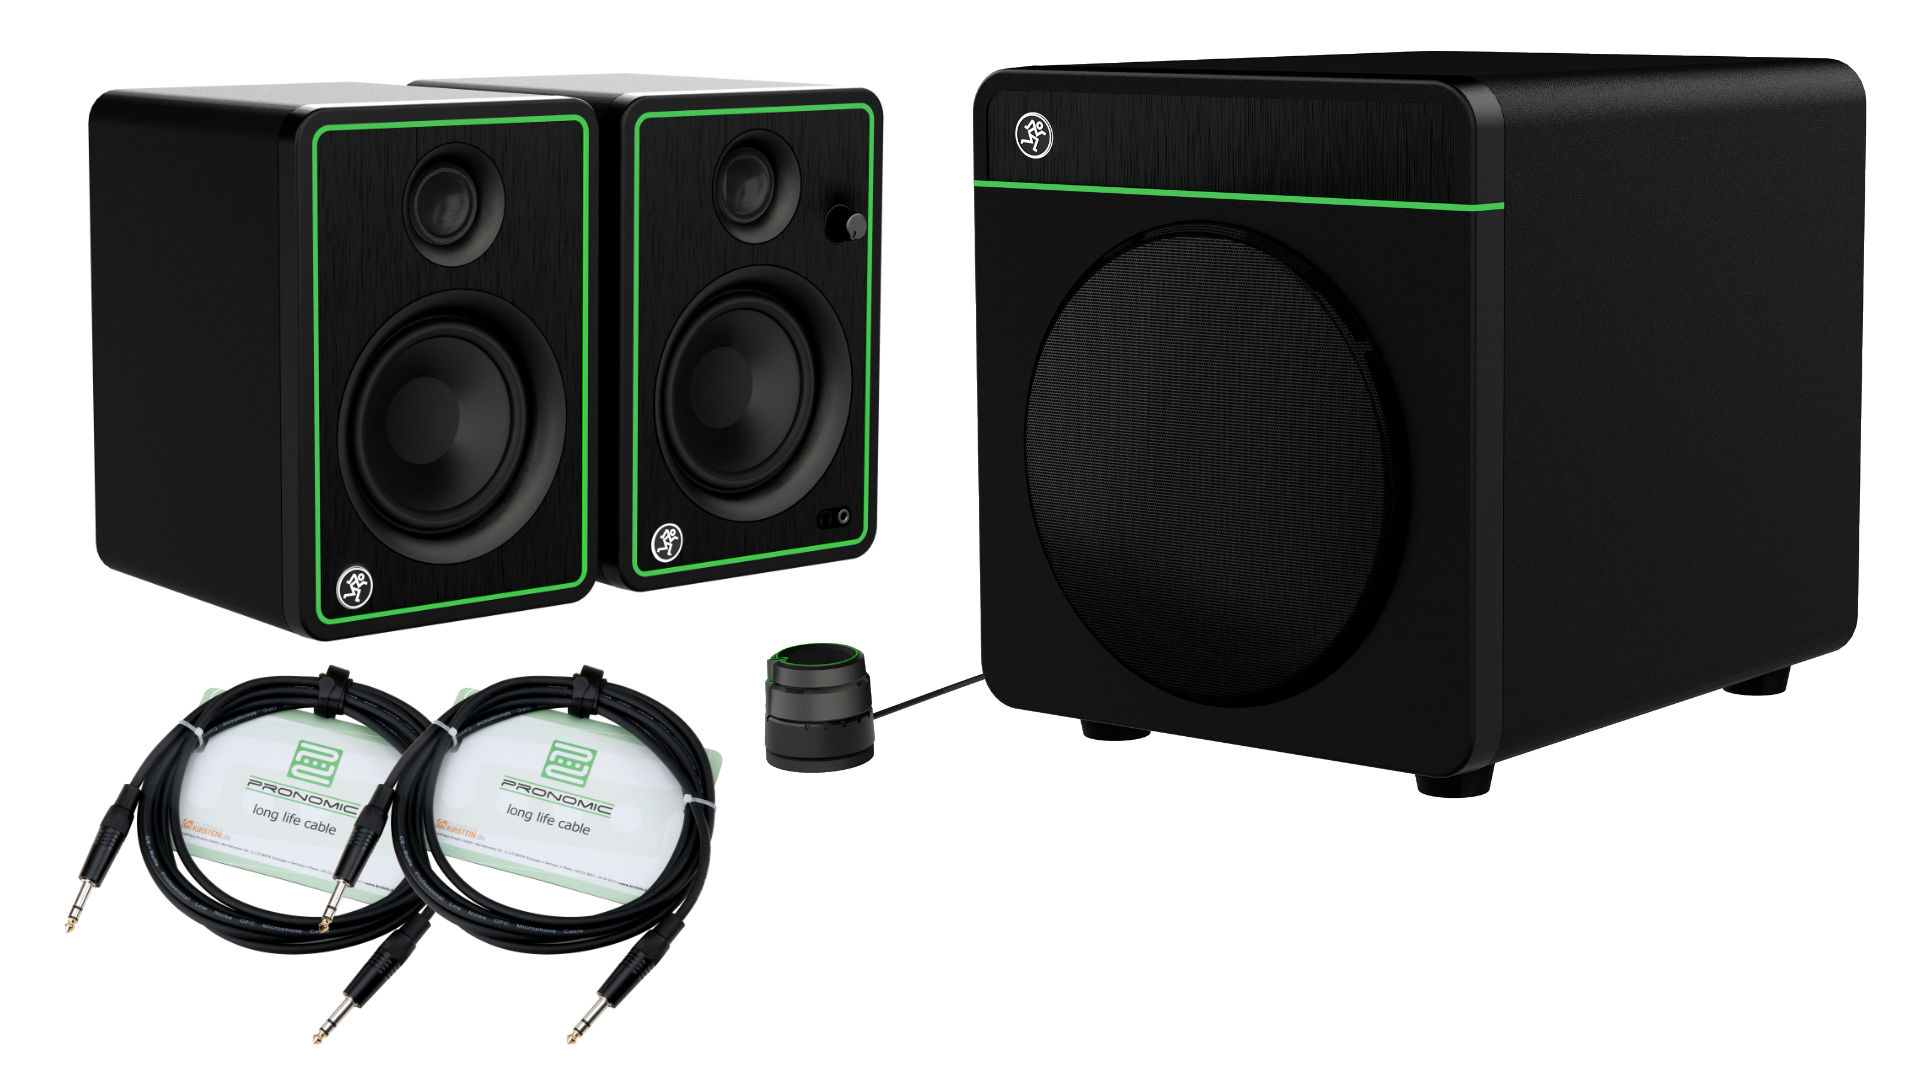 Studiomonitore - Mackie CR4 X Multimedia Bluetooth 2.1 Soundsystem - Onlineshop Musikhaus Kirstein